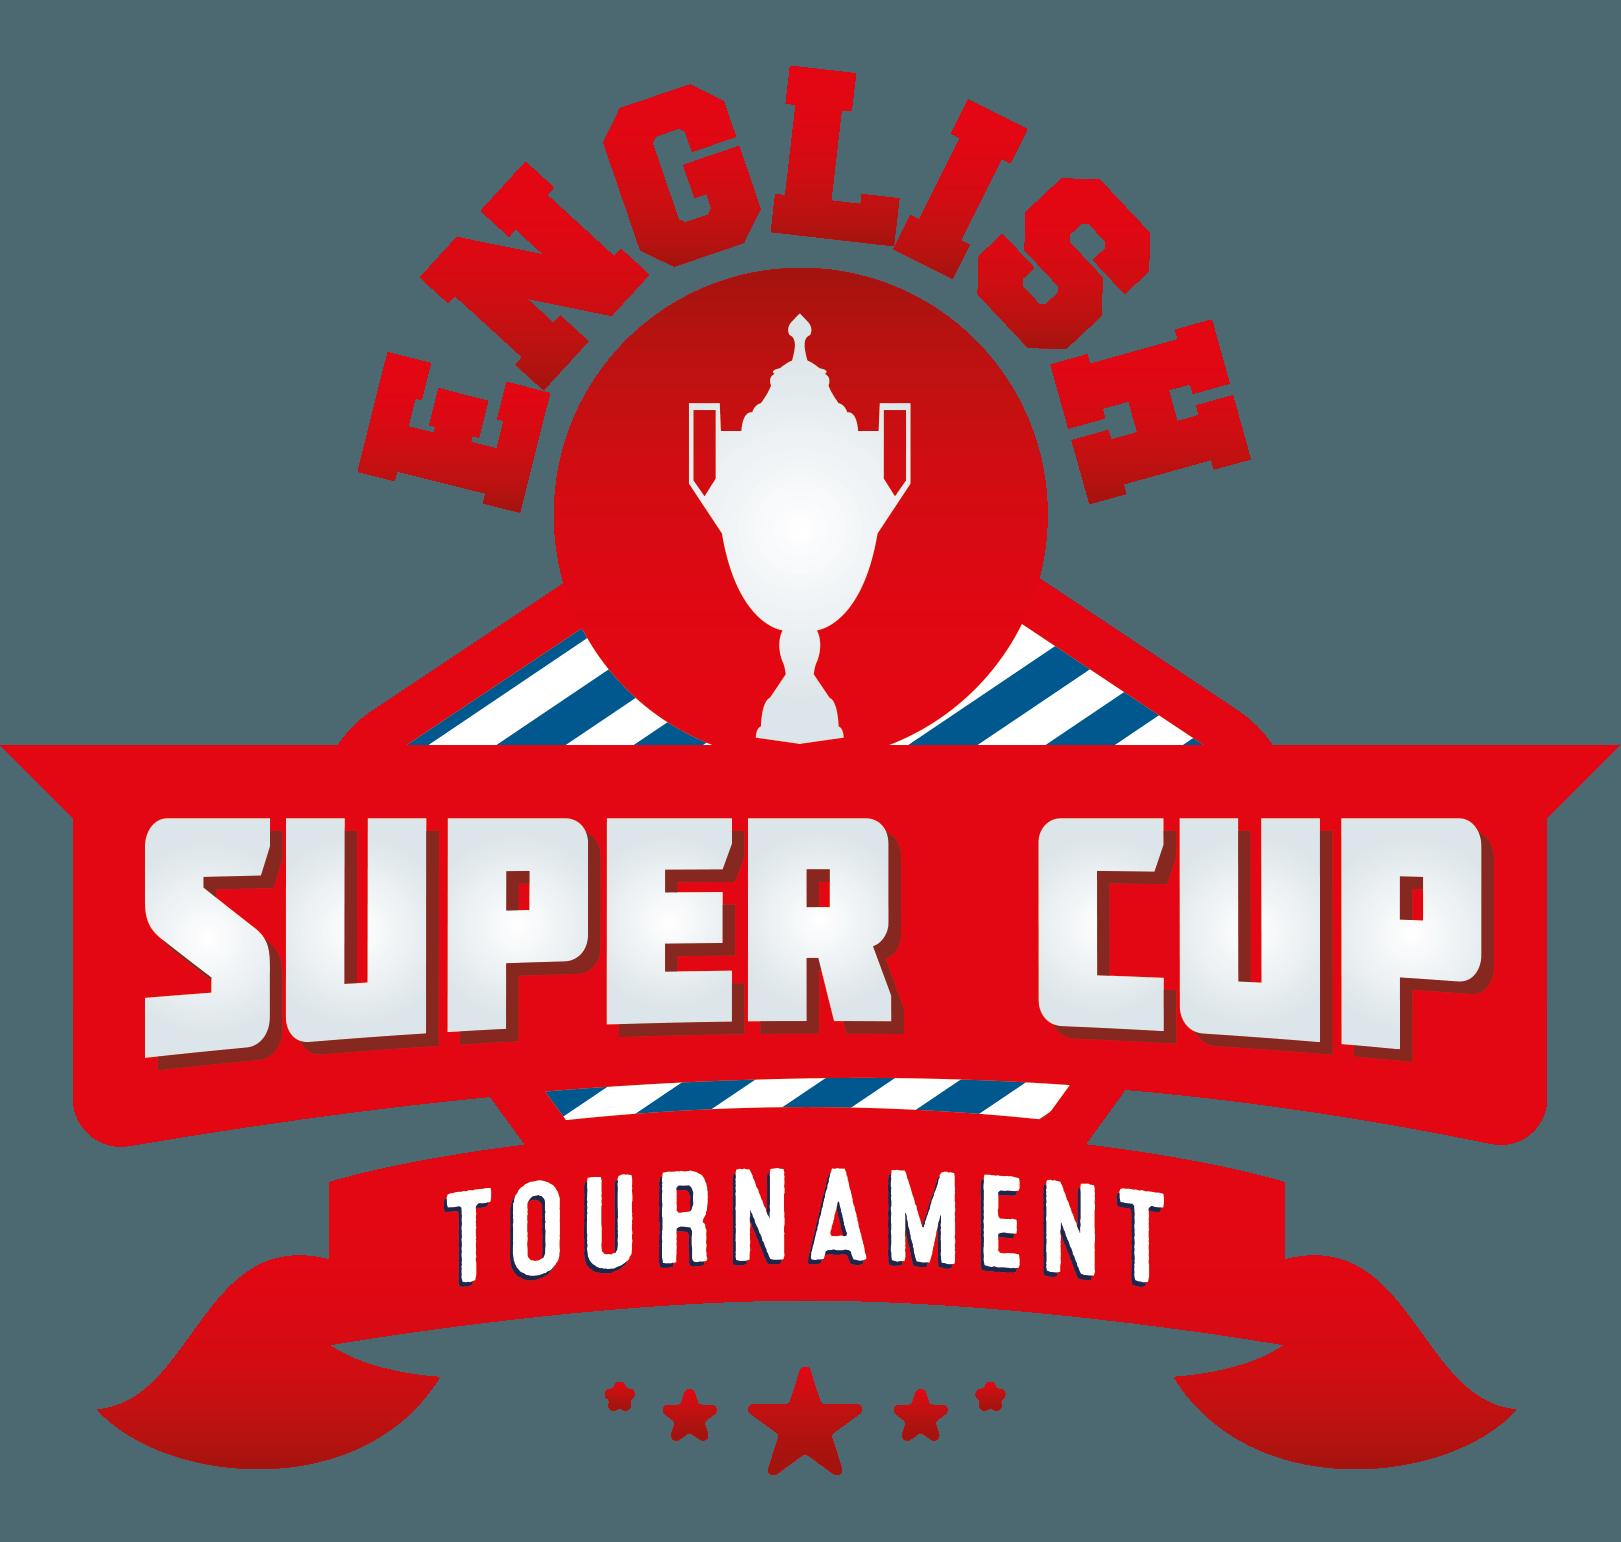 English International Super Cup Uk Football Tournament